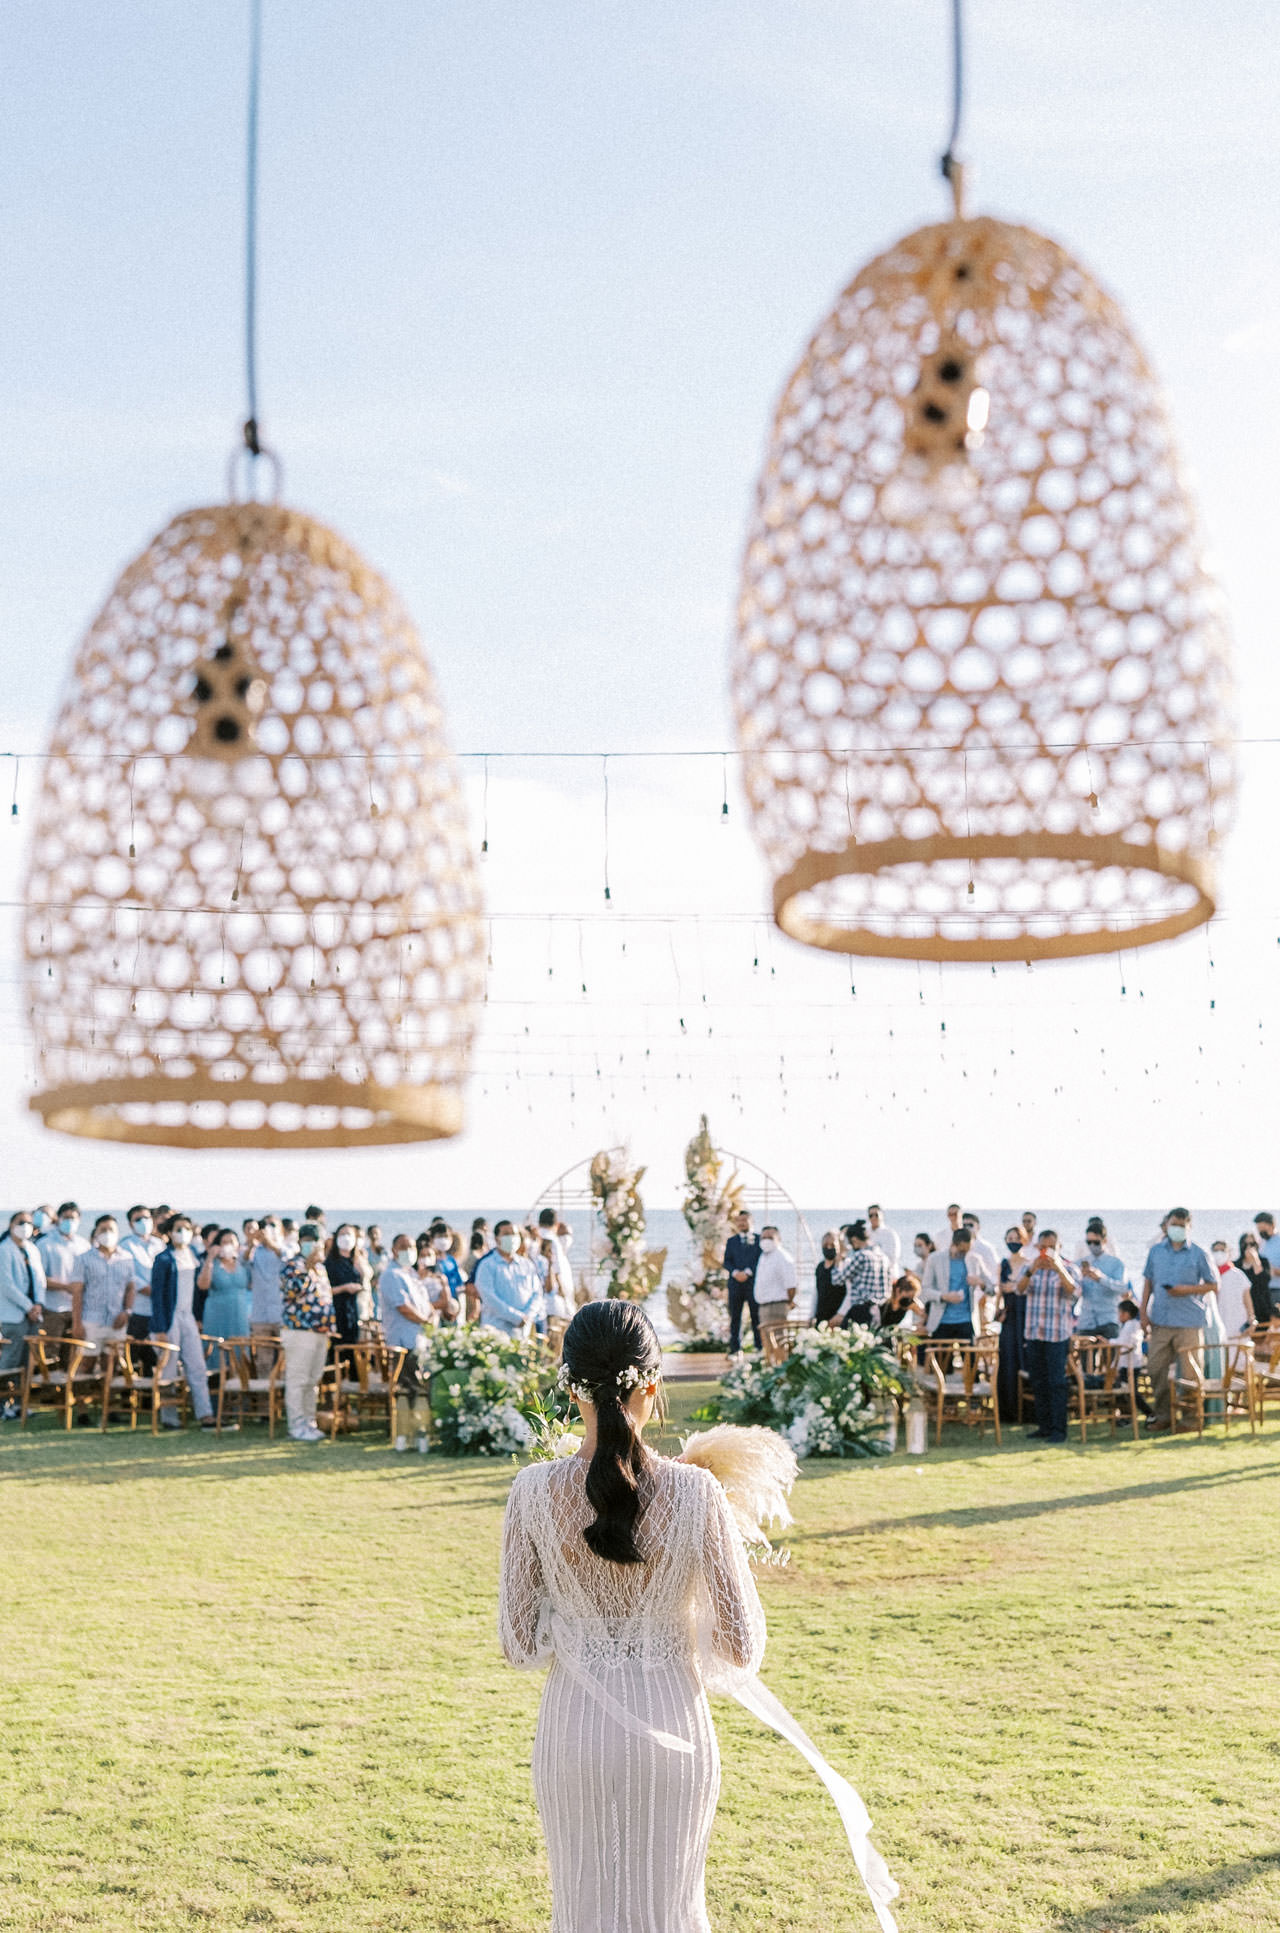 Bali Beach Glamping Wedding on a Luxury Tent 27